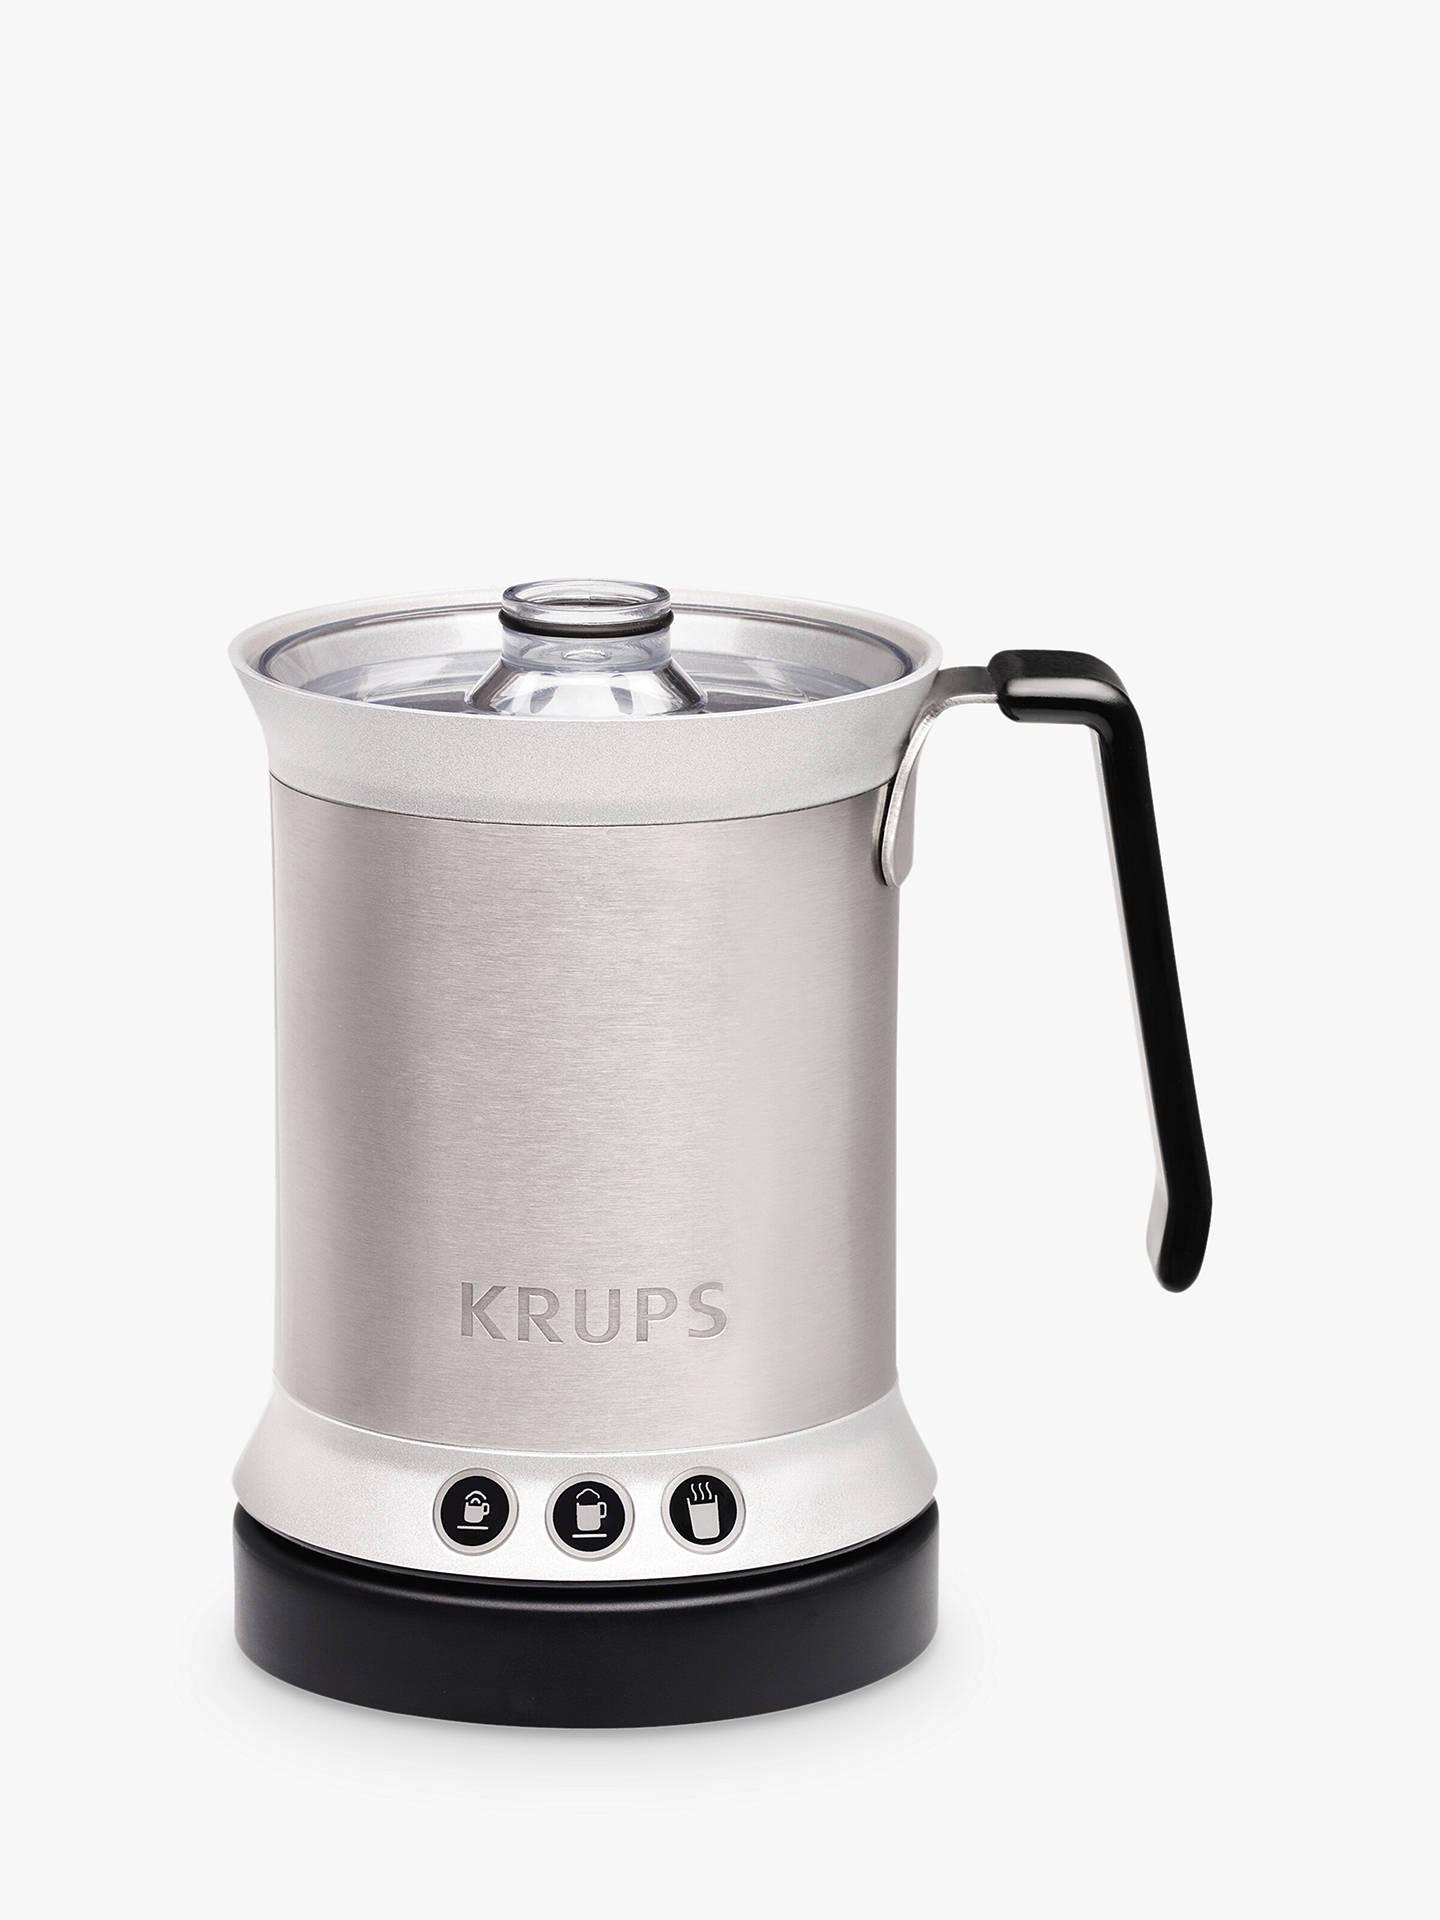 Krups Xl200044 Milk Frother